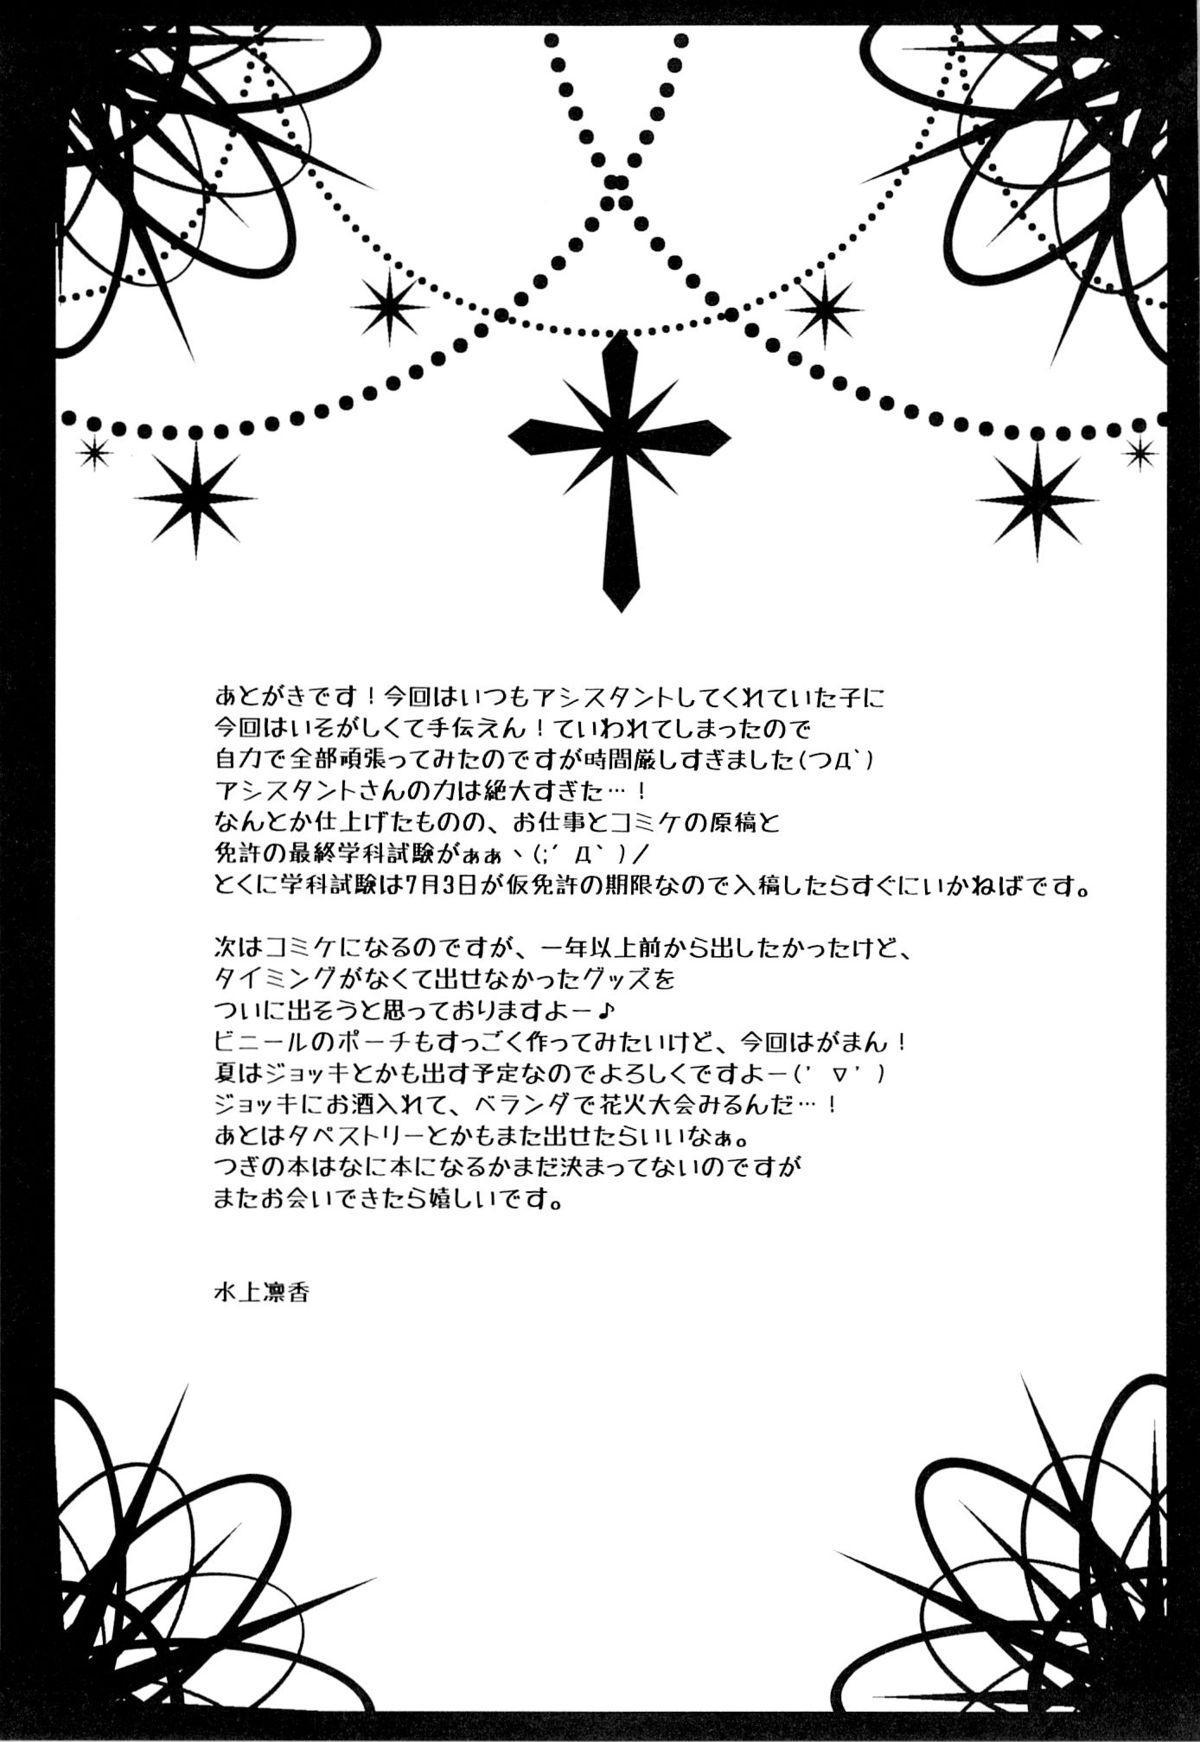 Hataraku Chii-chan! 2 11